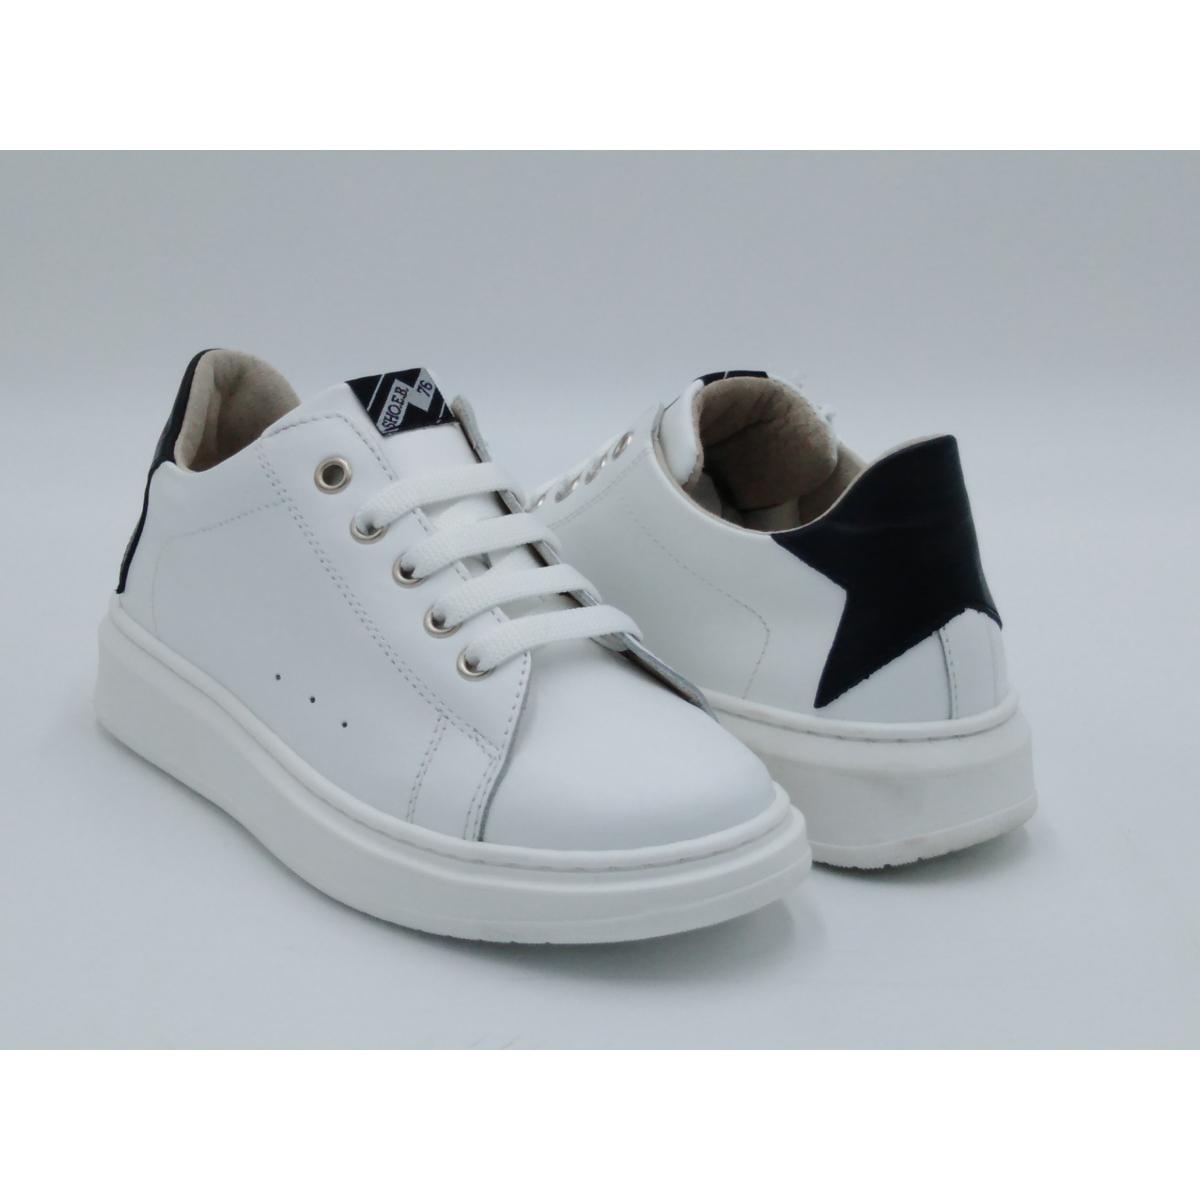 SHOEB 76 Sneaker bianca lacci